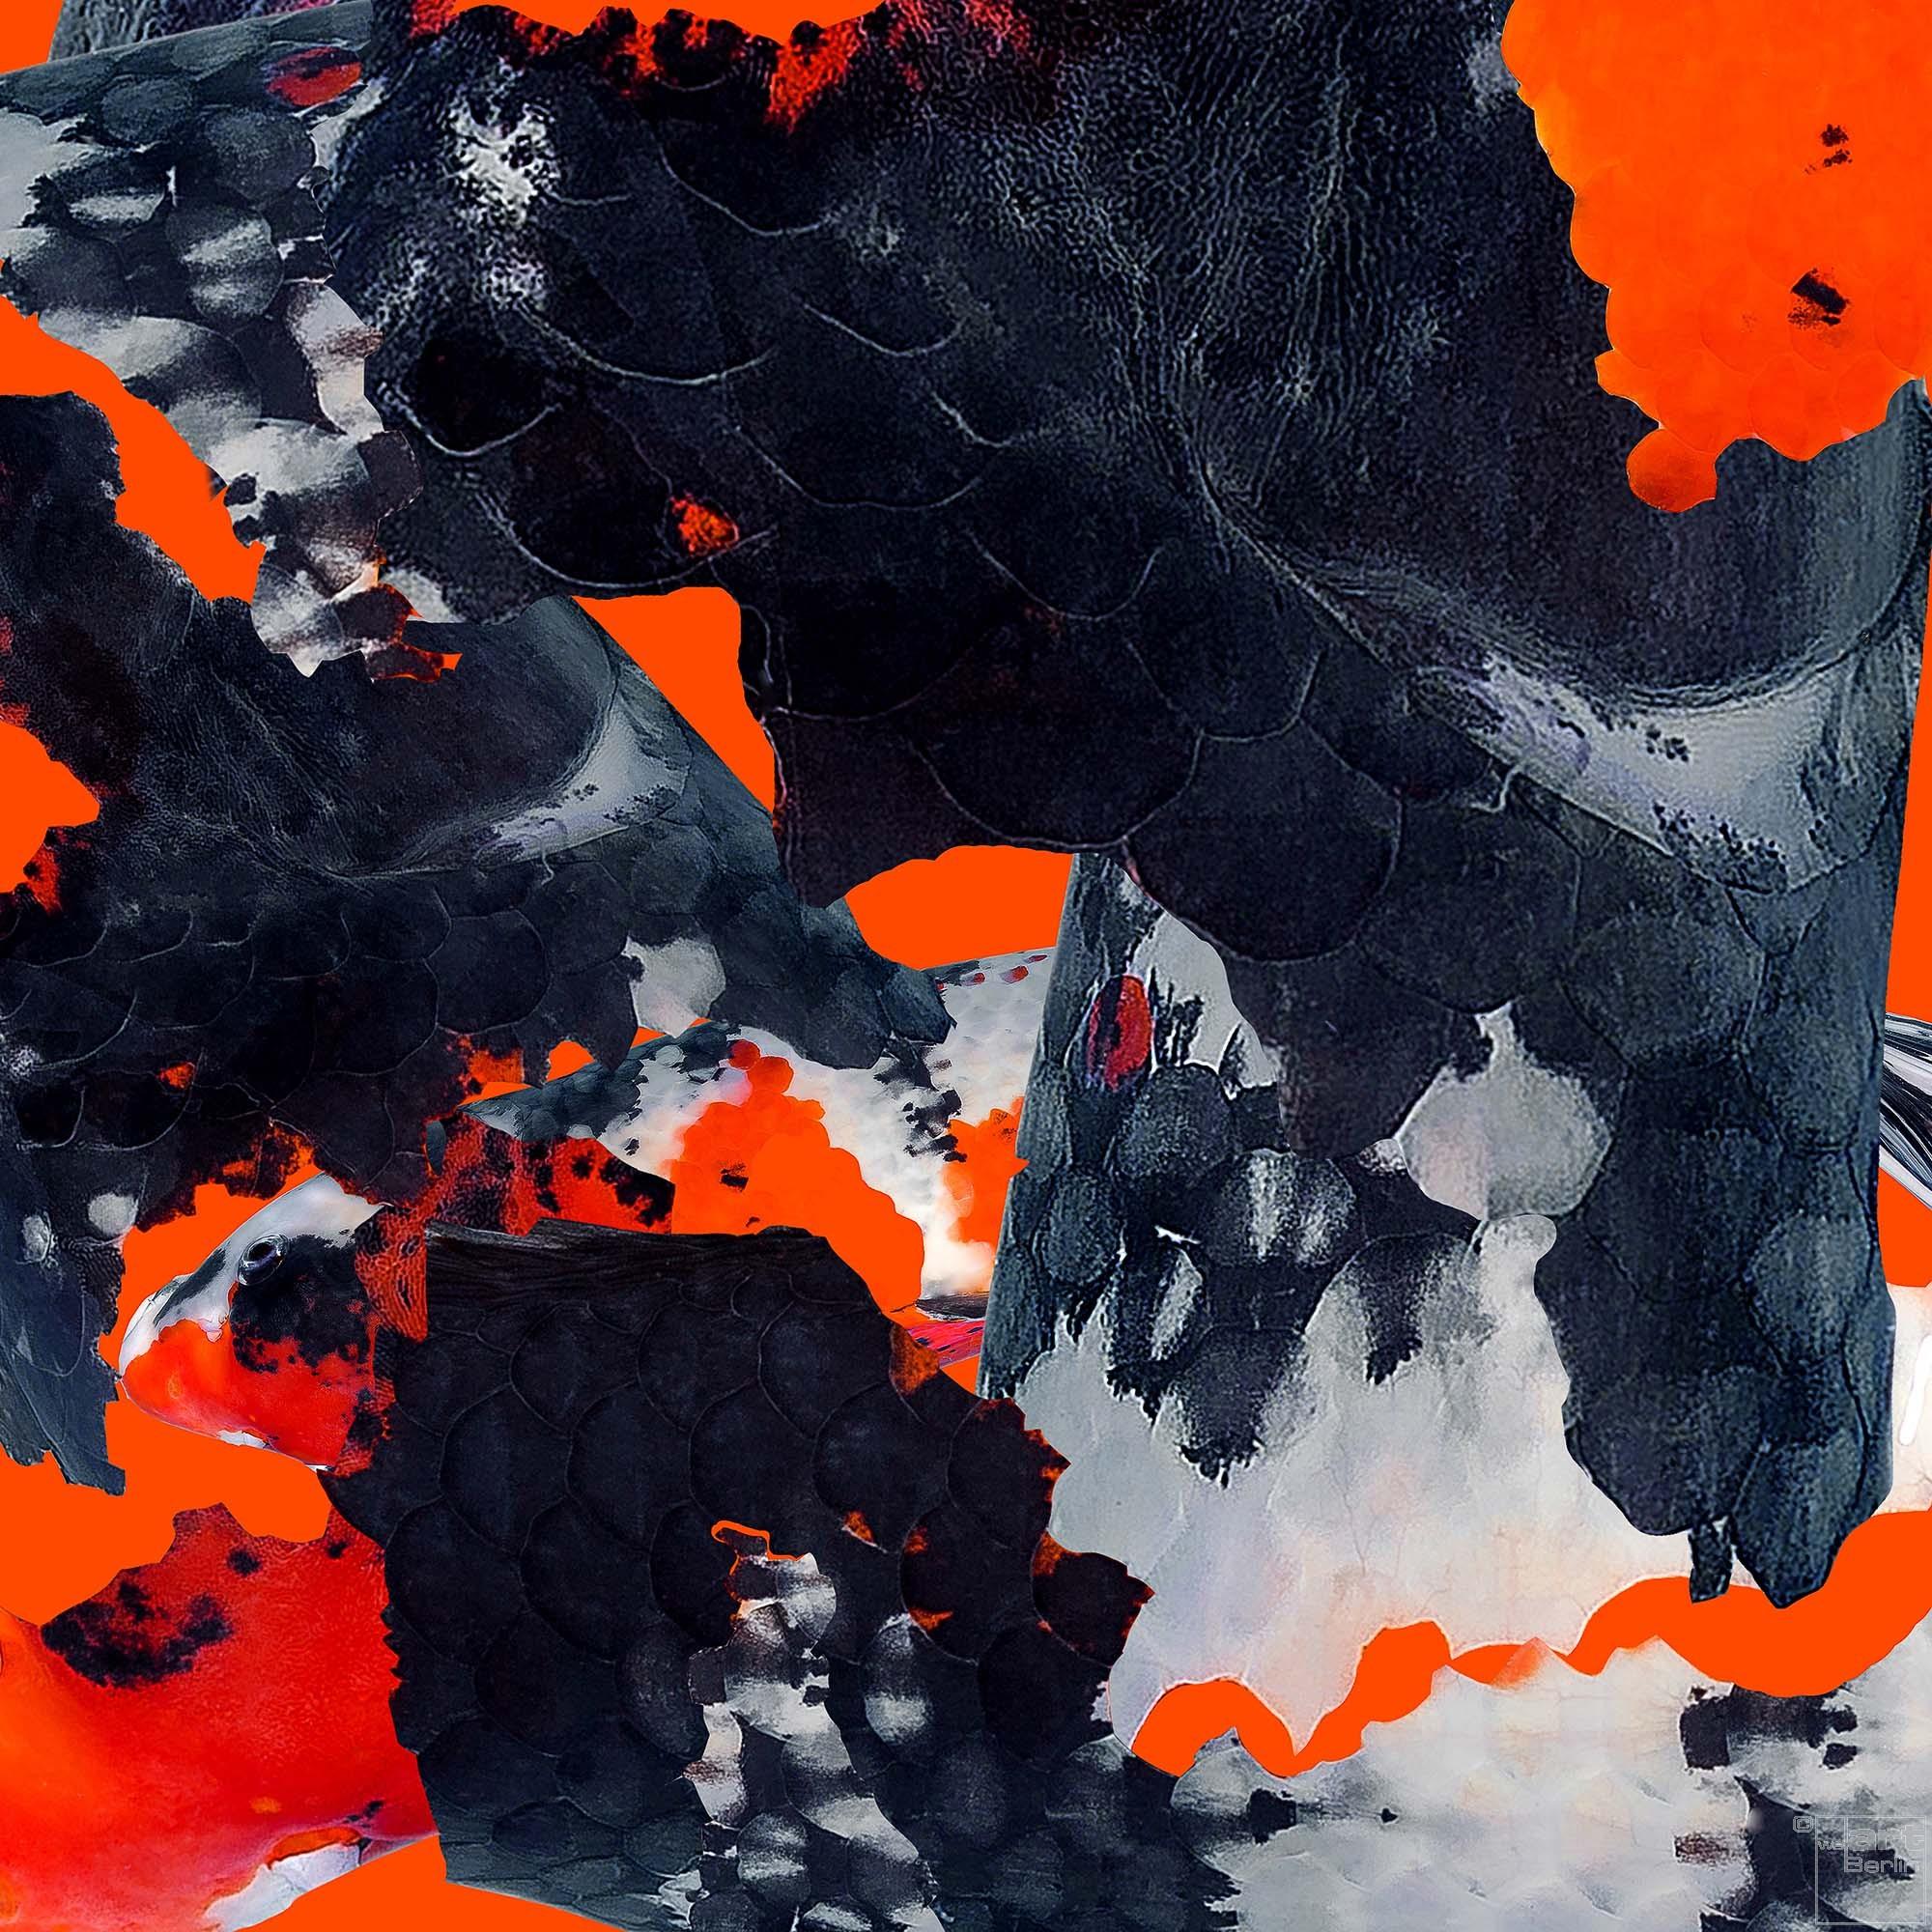 Koi Destroy 1 | Fotografie von Theresa Lambrecht, Echter FotoAbzug auf Alu Dibond, limitierte Edition